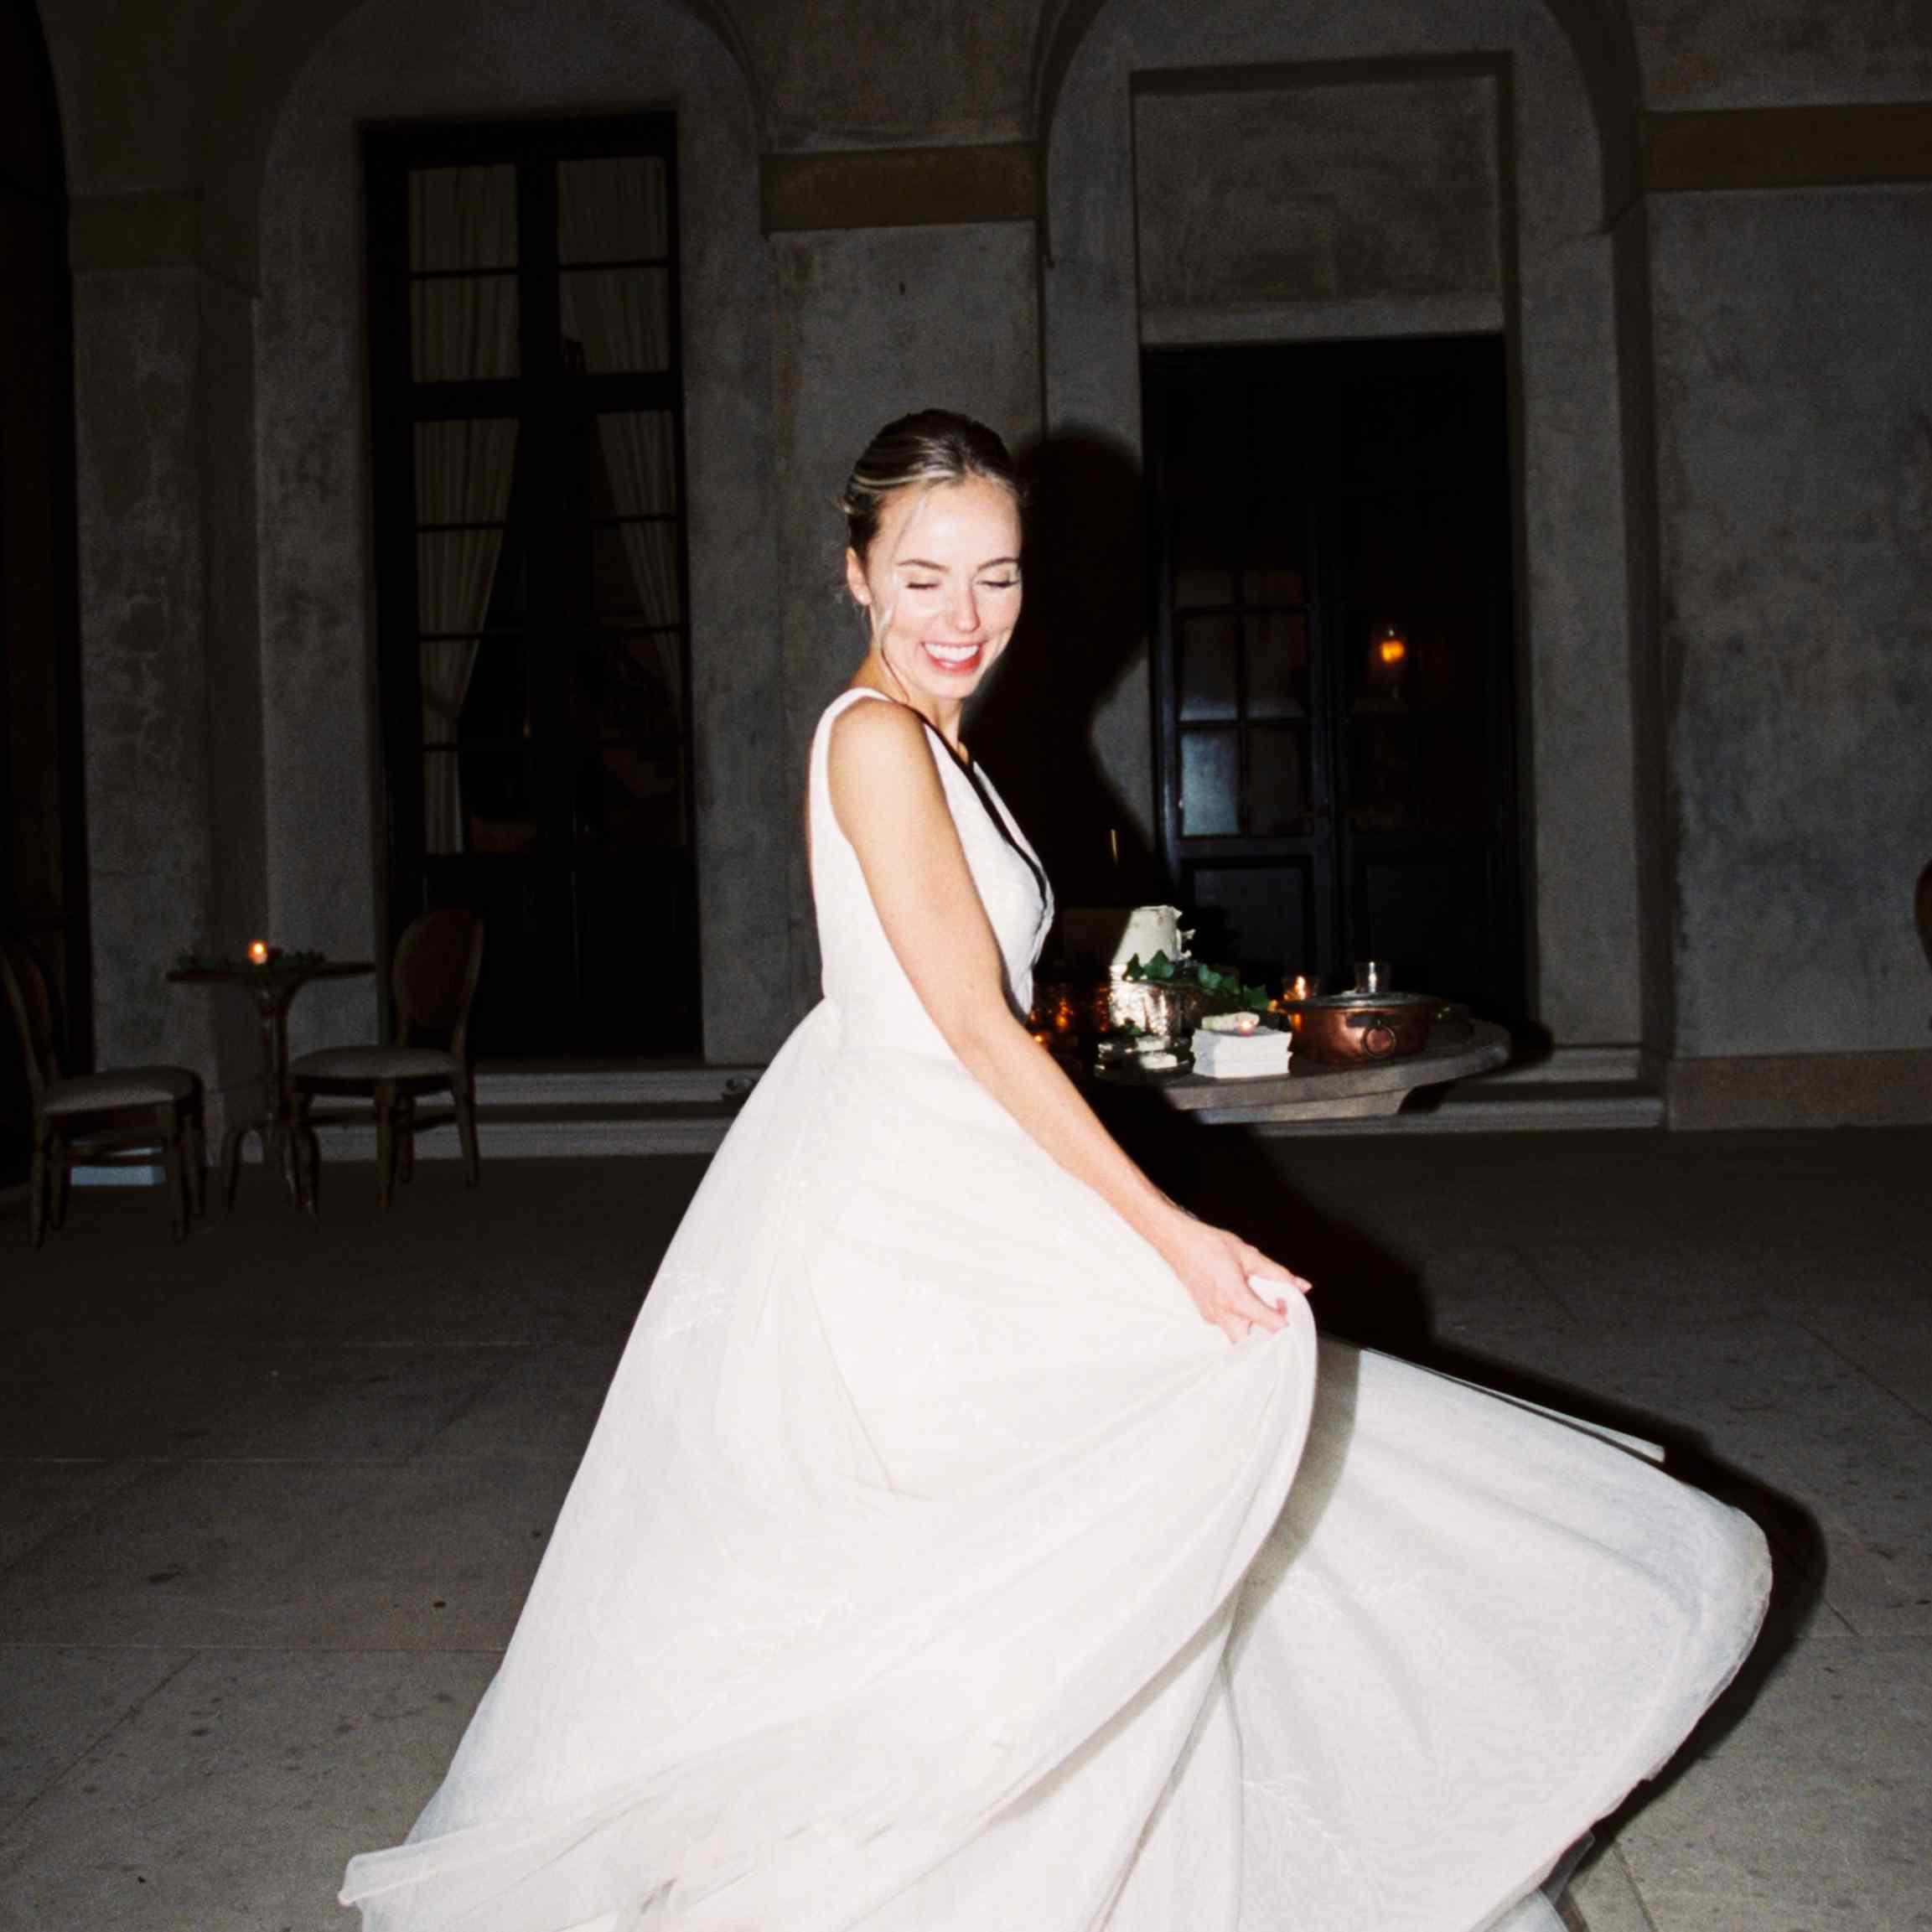 <p>bride dancing swinging dress</p><br><br>